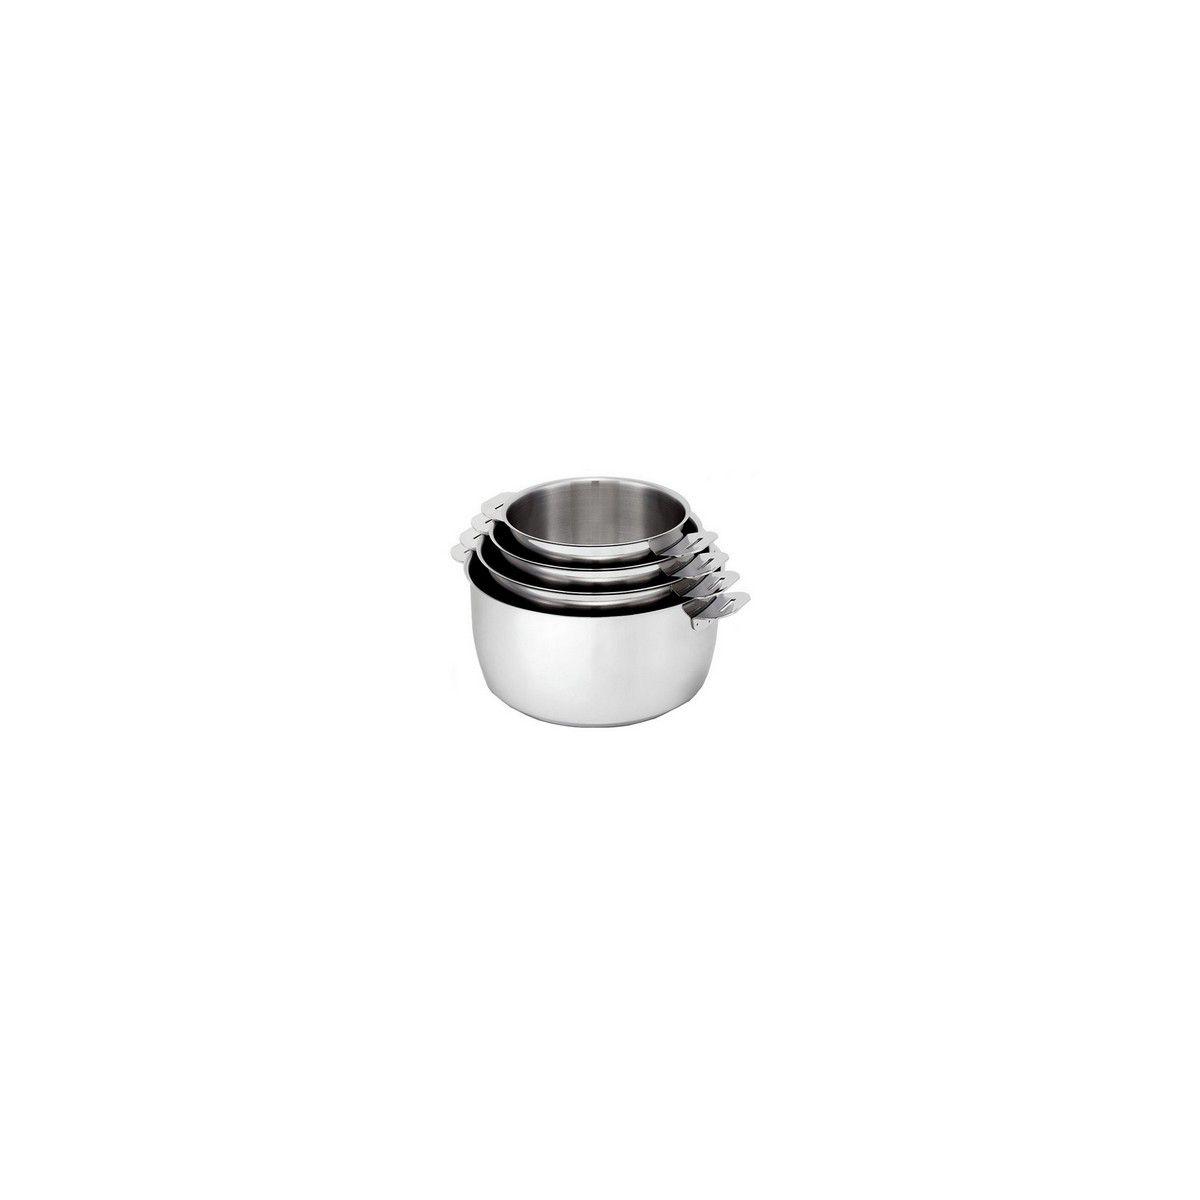 Batterie de cuisine KITCHEN FUN Move On 4 casseroles diam14-16-18-20cm